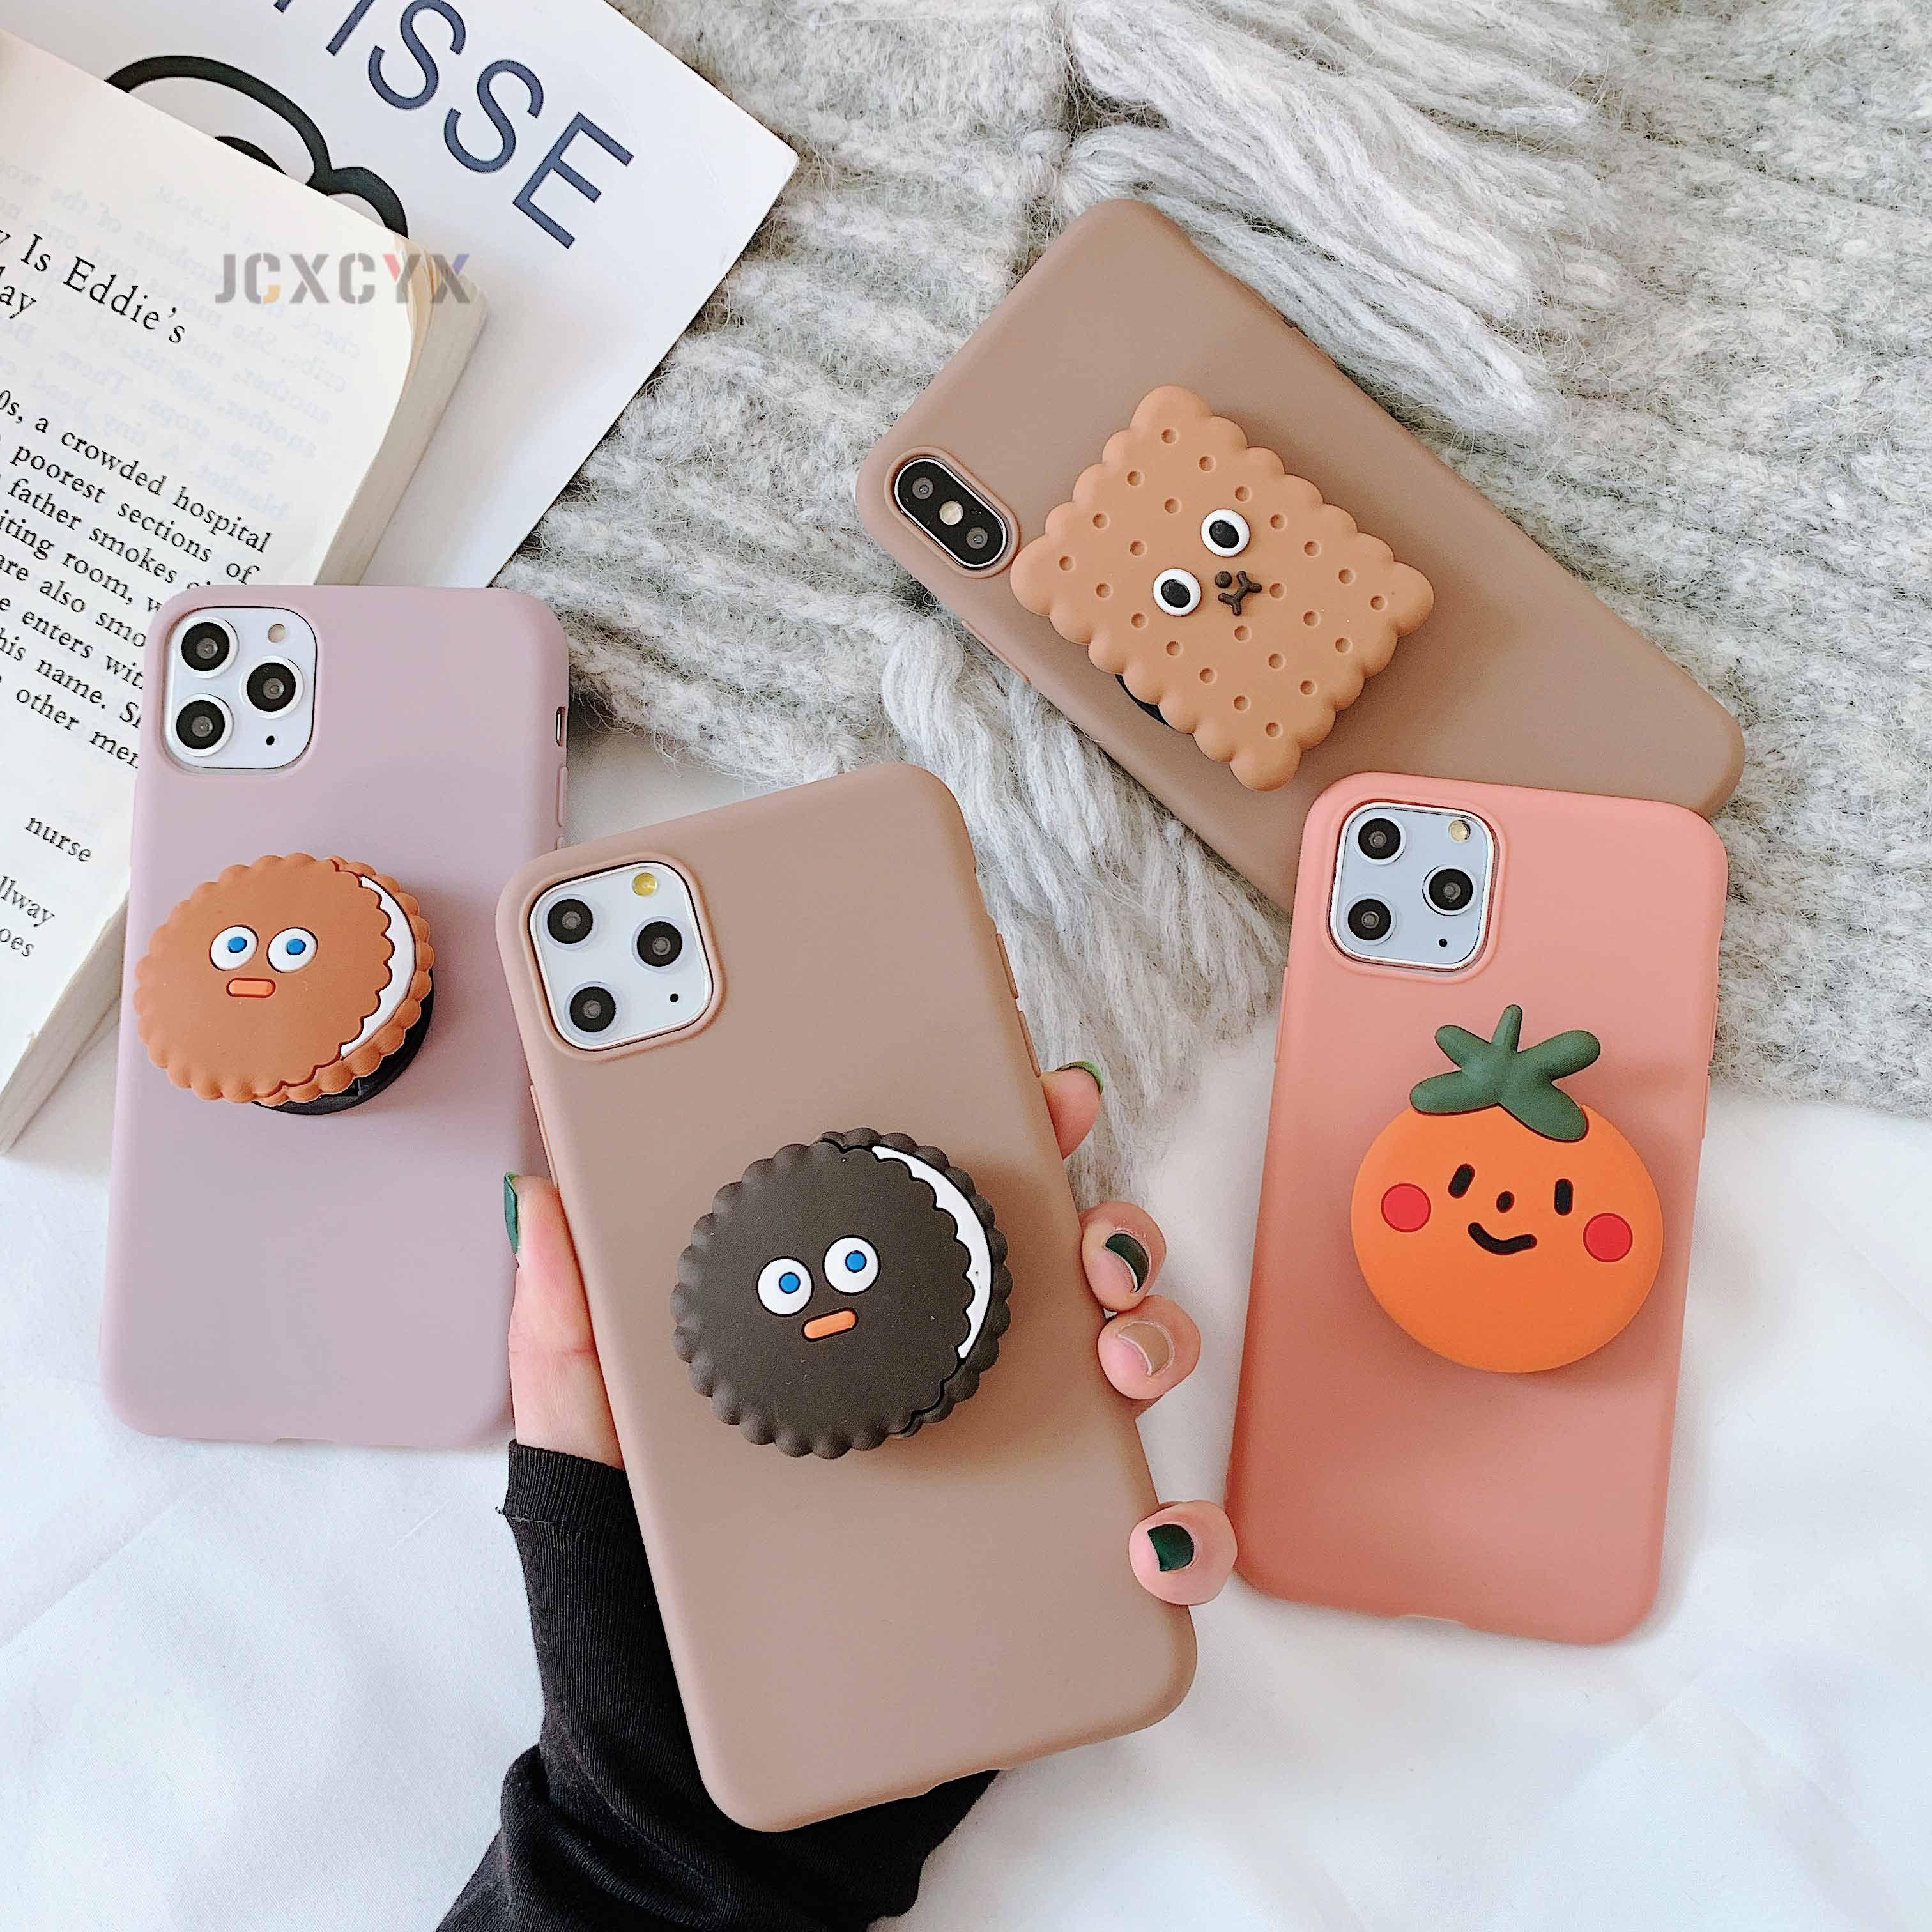 3D Cute Cartoo Oreo Cookies Мягкий телефон случае Для iphonephone X XR XS 11 Pro Max 6S 7 8 плюс держатель чехол для Samsung S8 S9 S10 Примечание